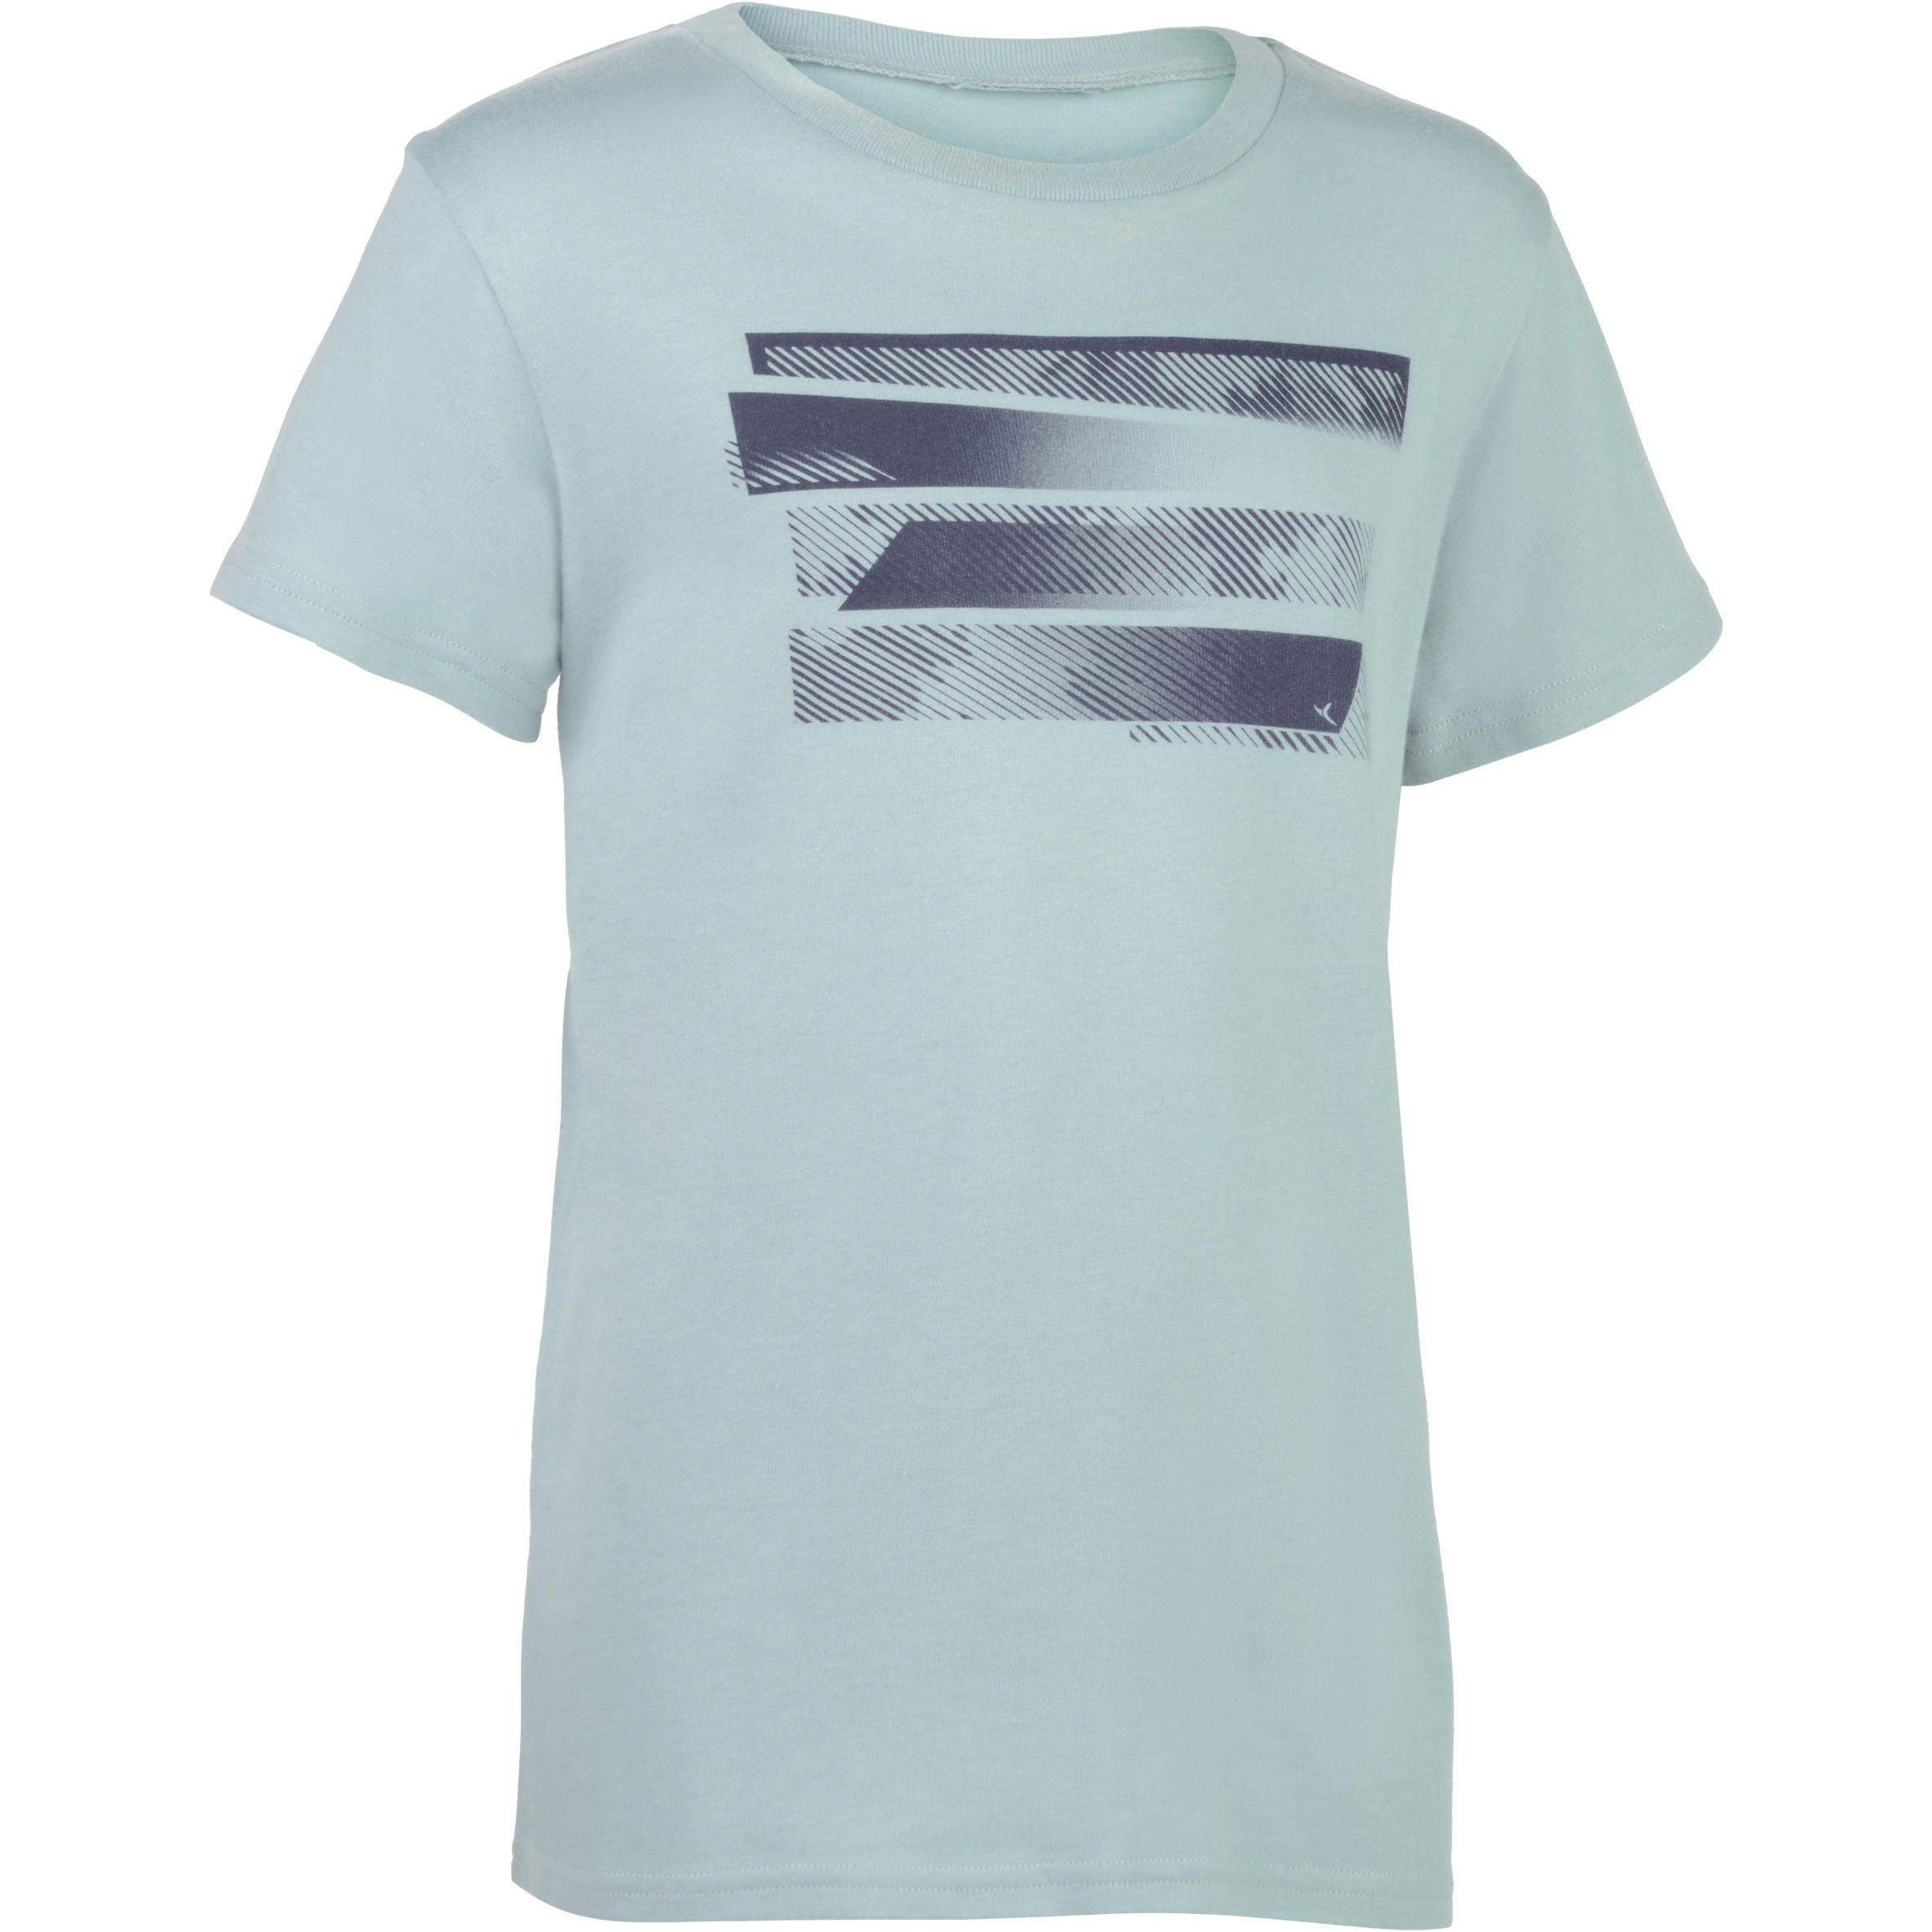 Tee-shirt 100 manches courtes gym garçon imprimé gris